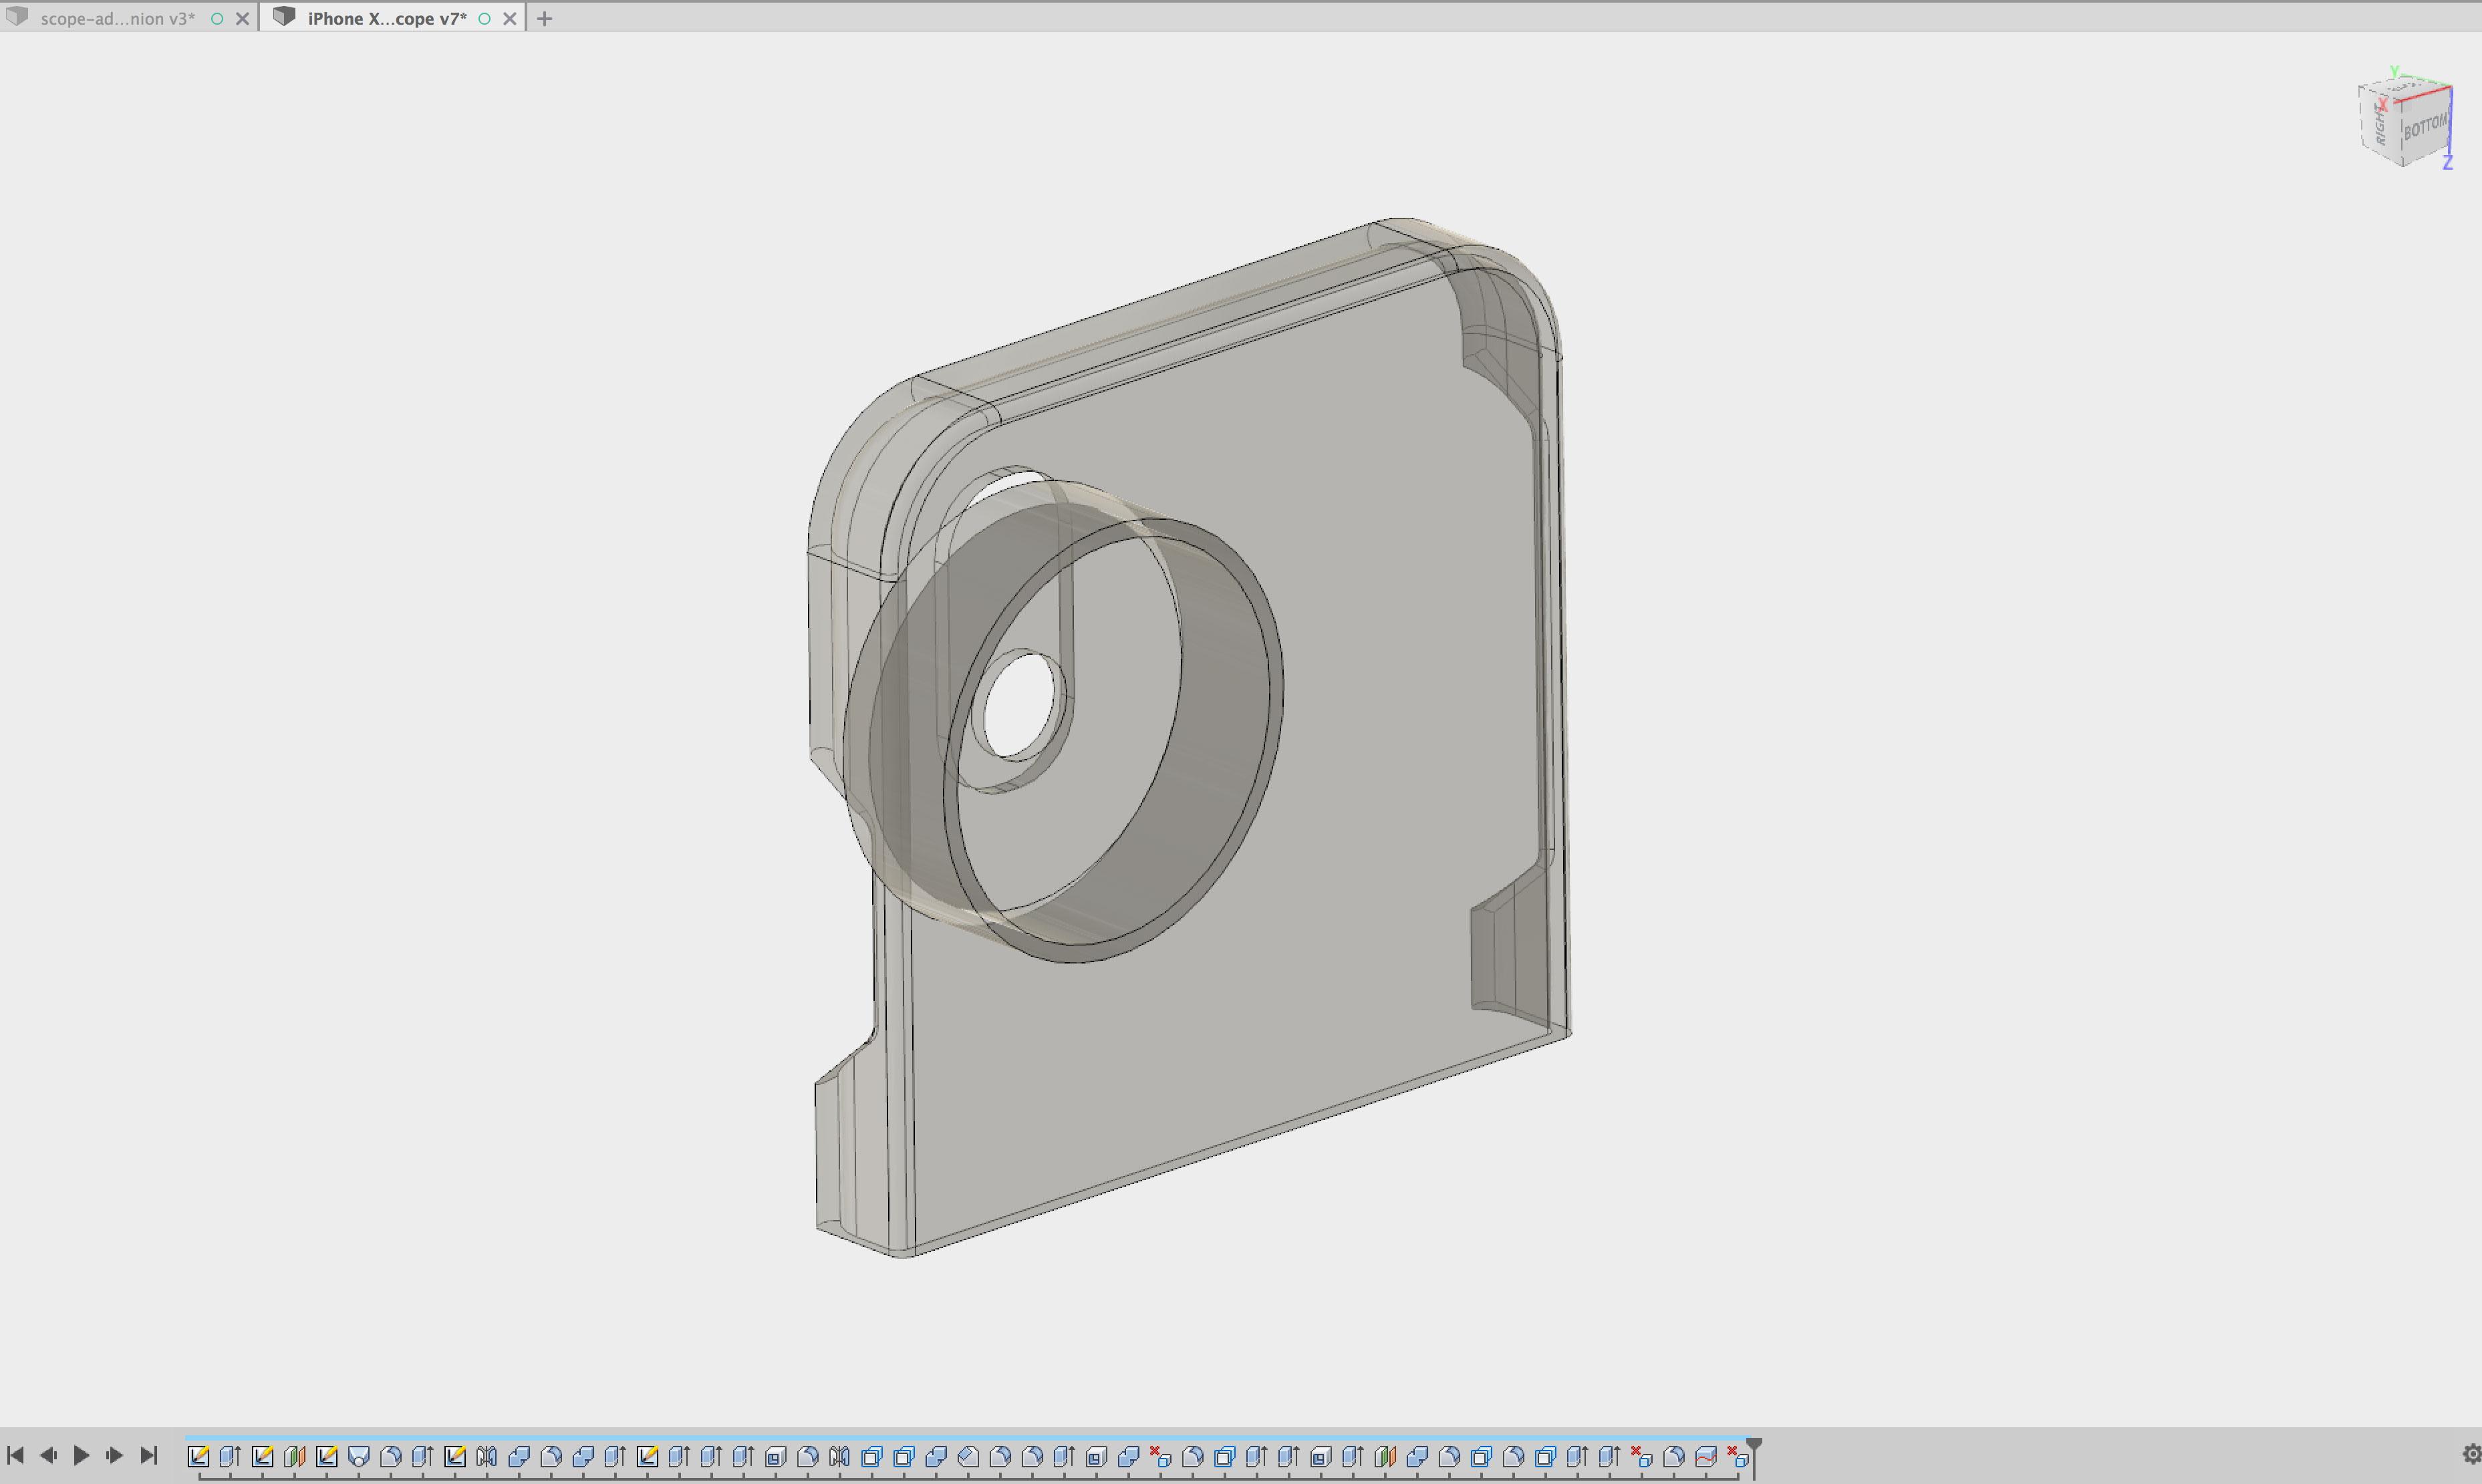 3d_printing_phone-adapter.jpg